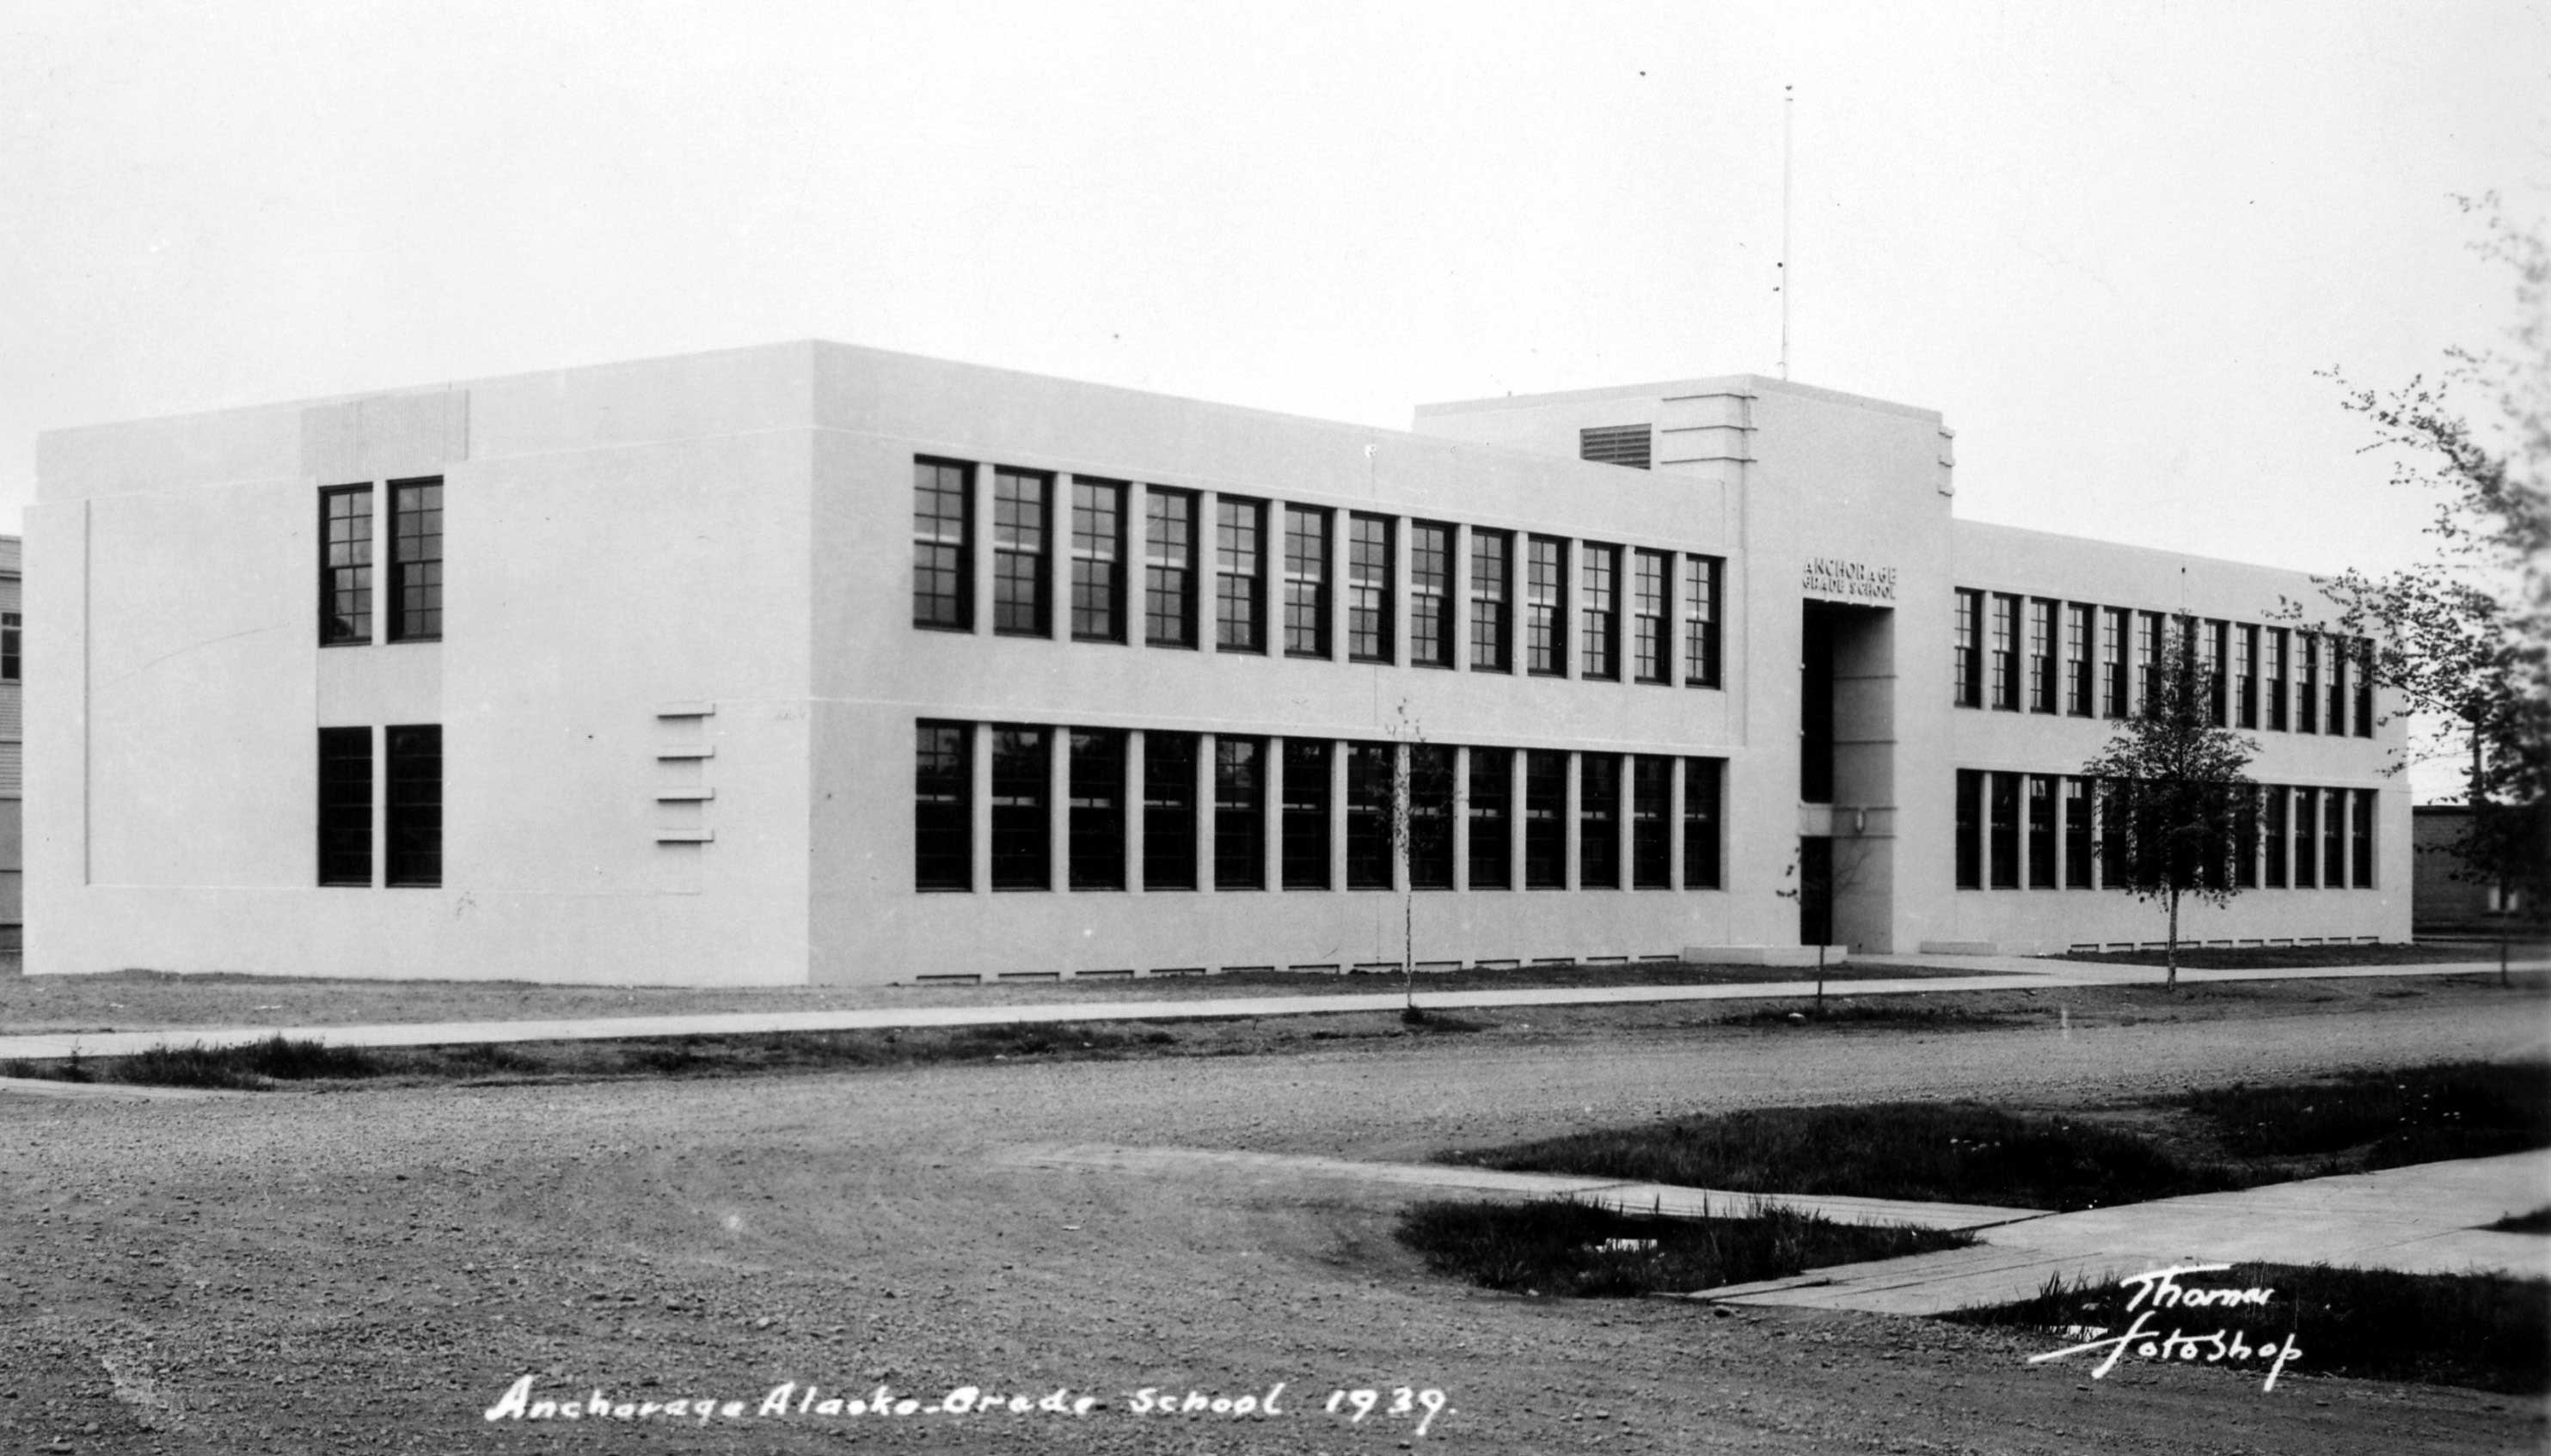 Manley william a alaska history anchorage central grade school malvernweather Choice Image